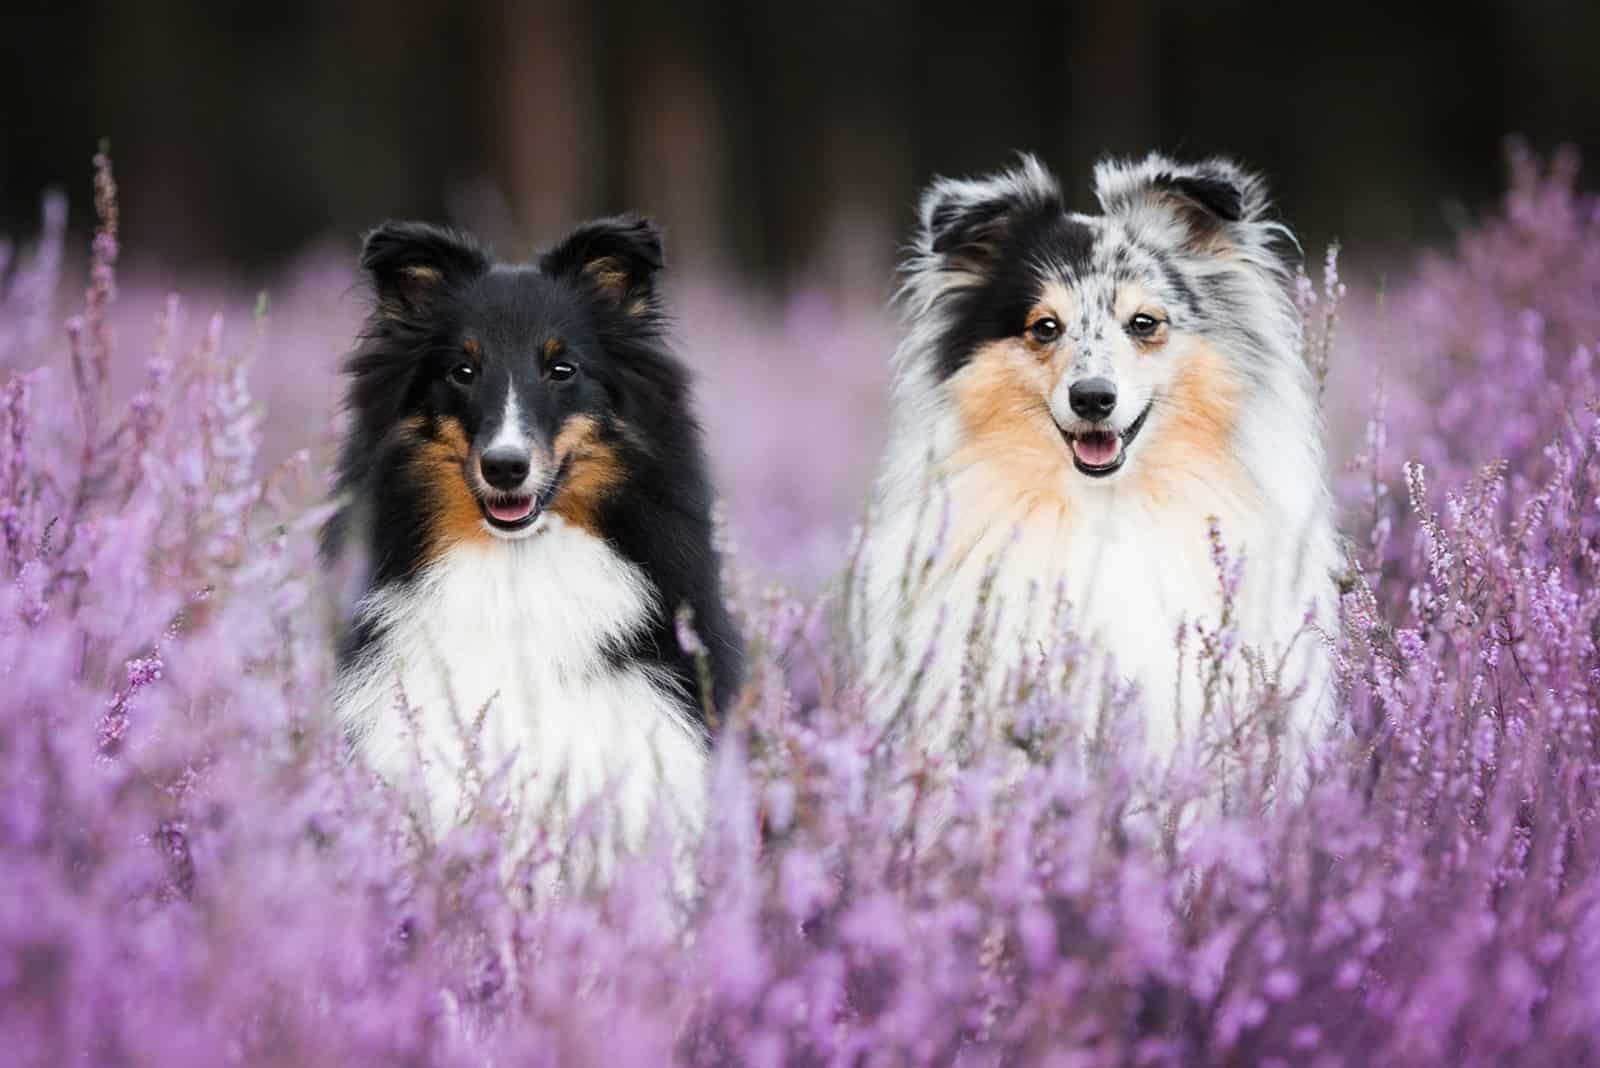 Two cute dogs in flowers